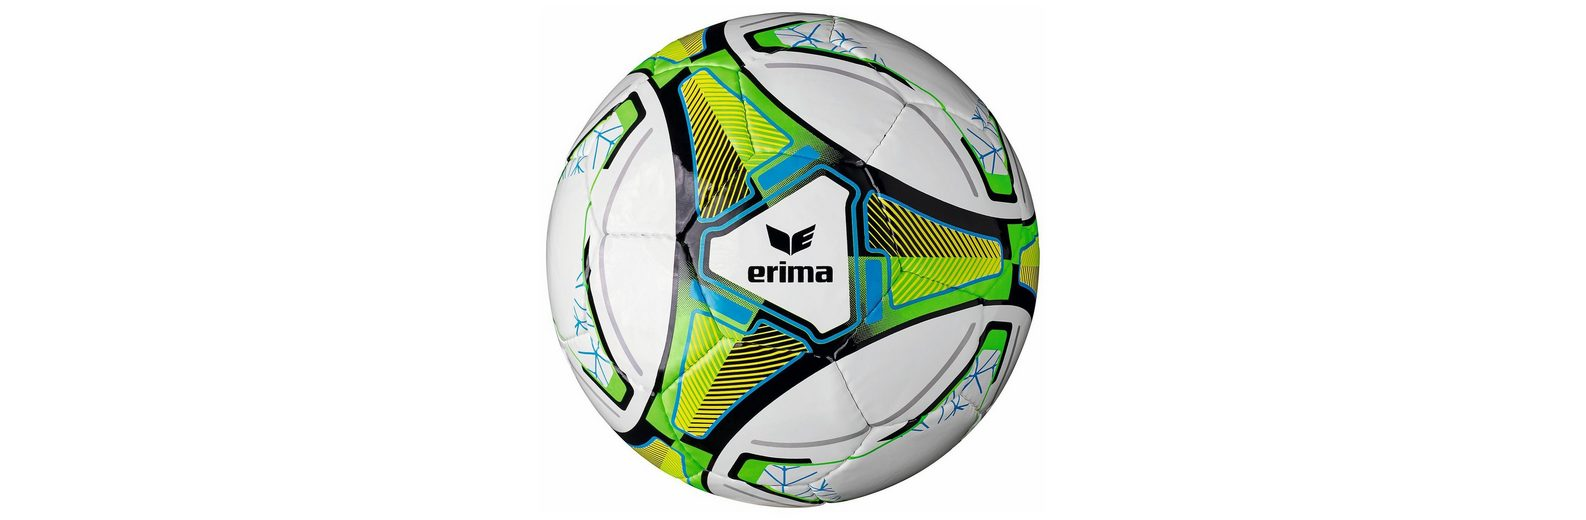 ERIMA Allround Lite 350 Trainingsball